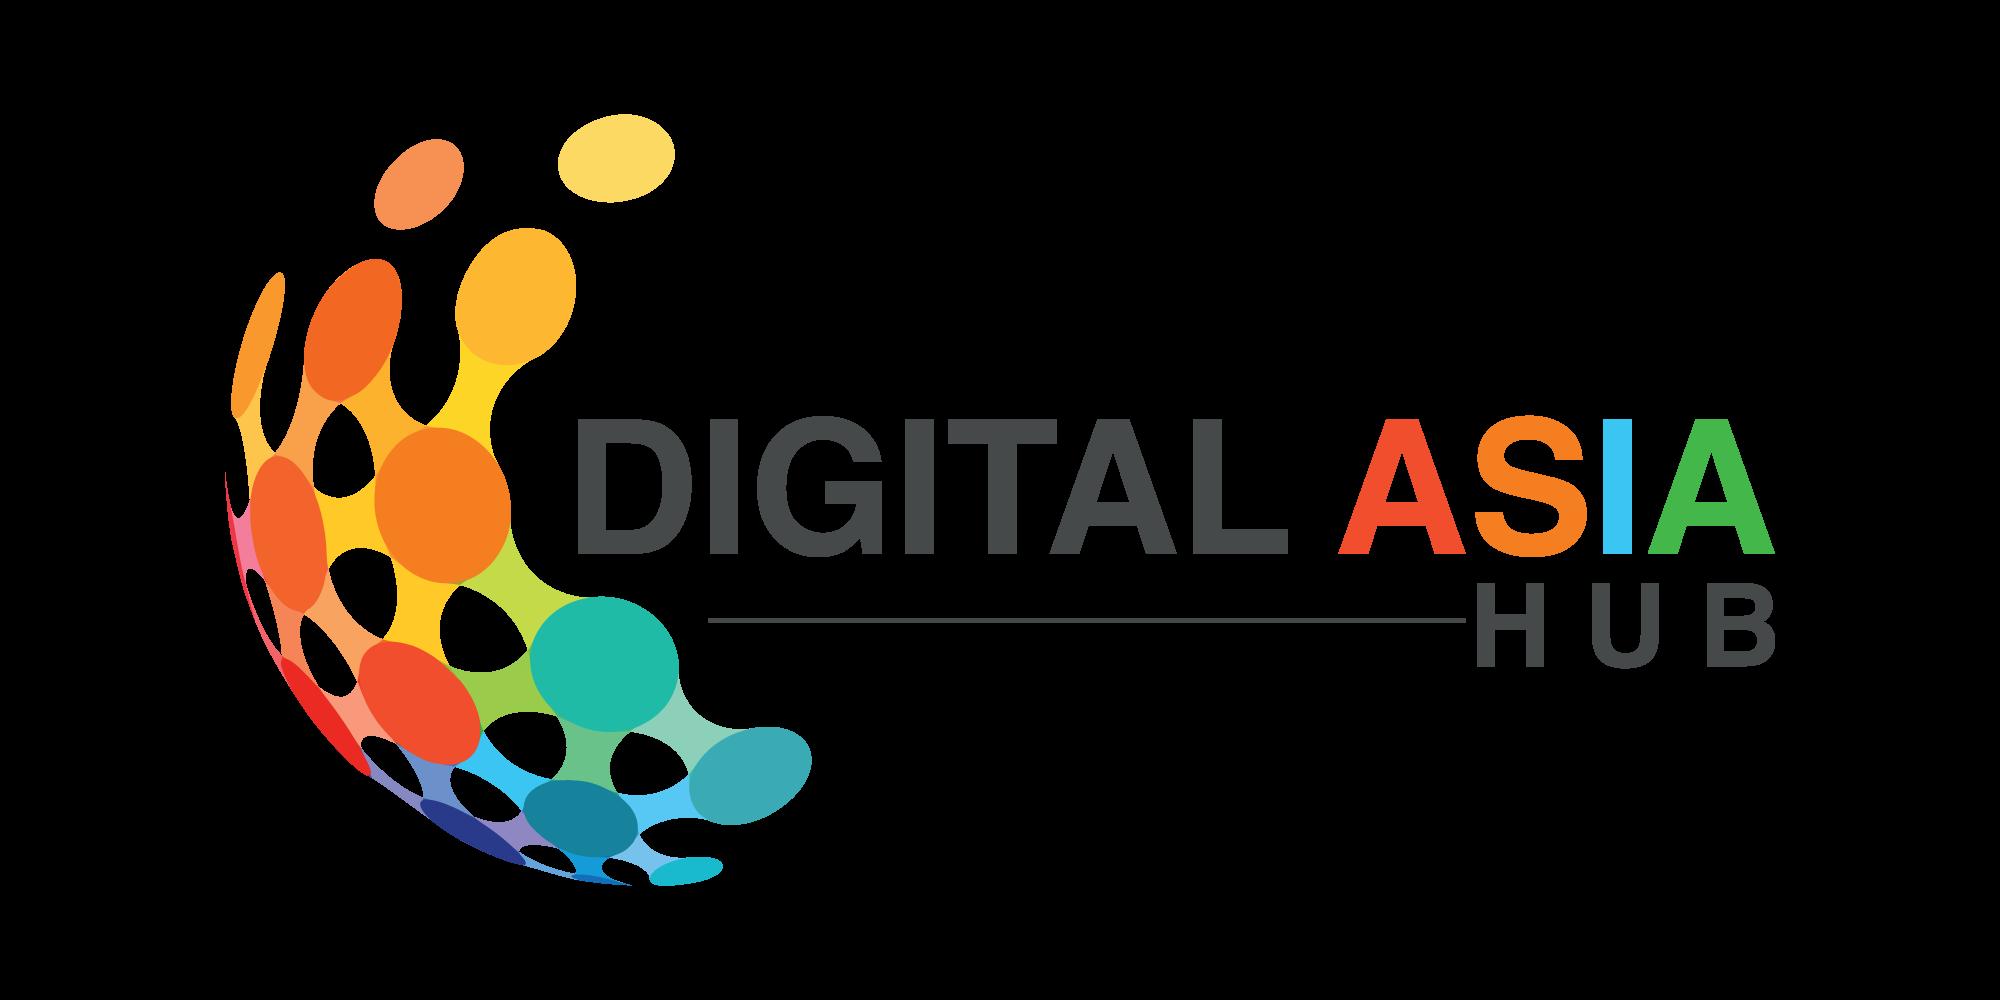 Digital Asia Hub